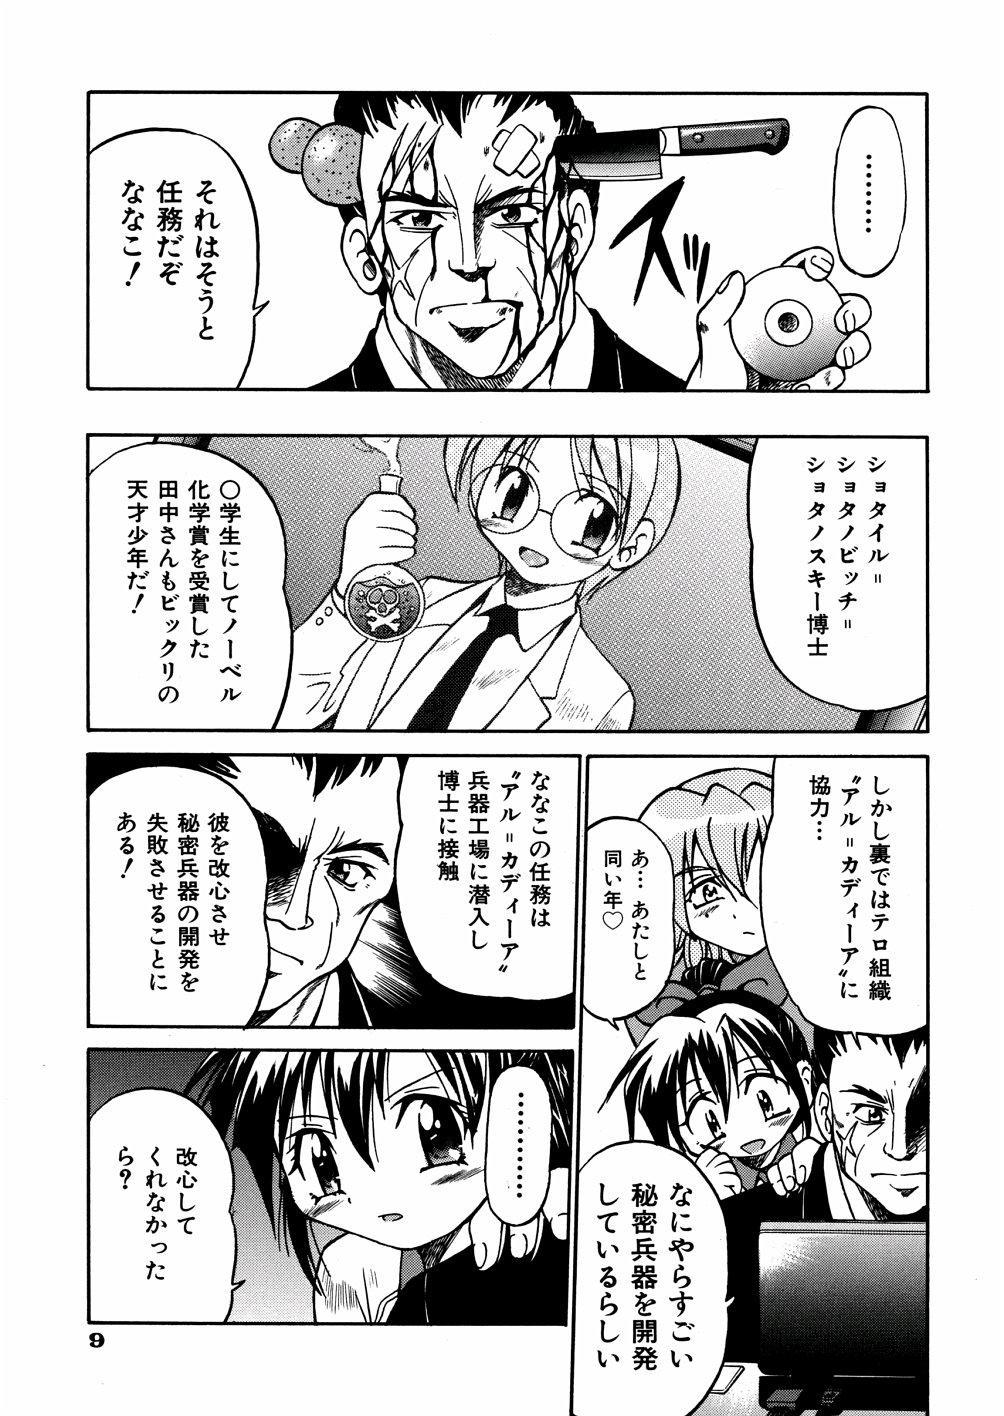 00 Nanako - Agent Nanako 11